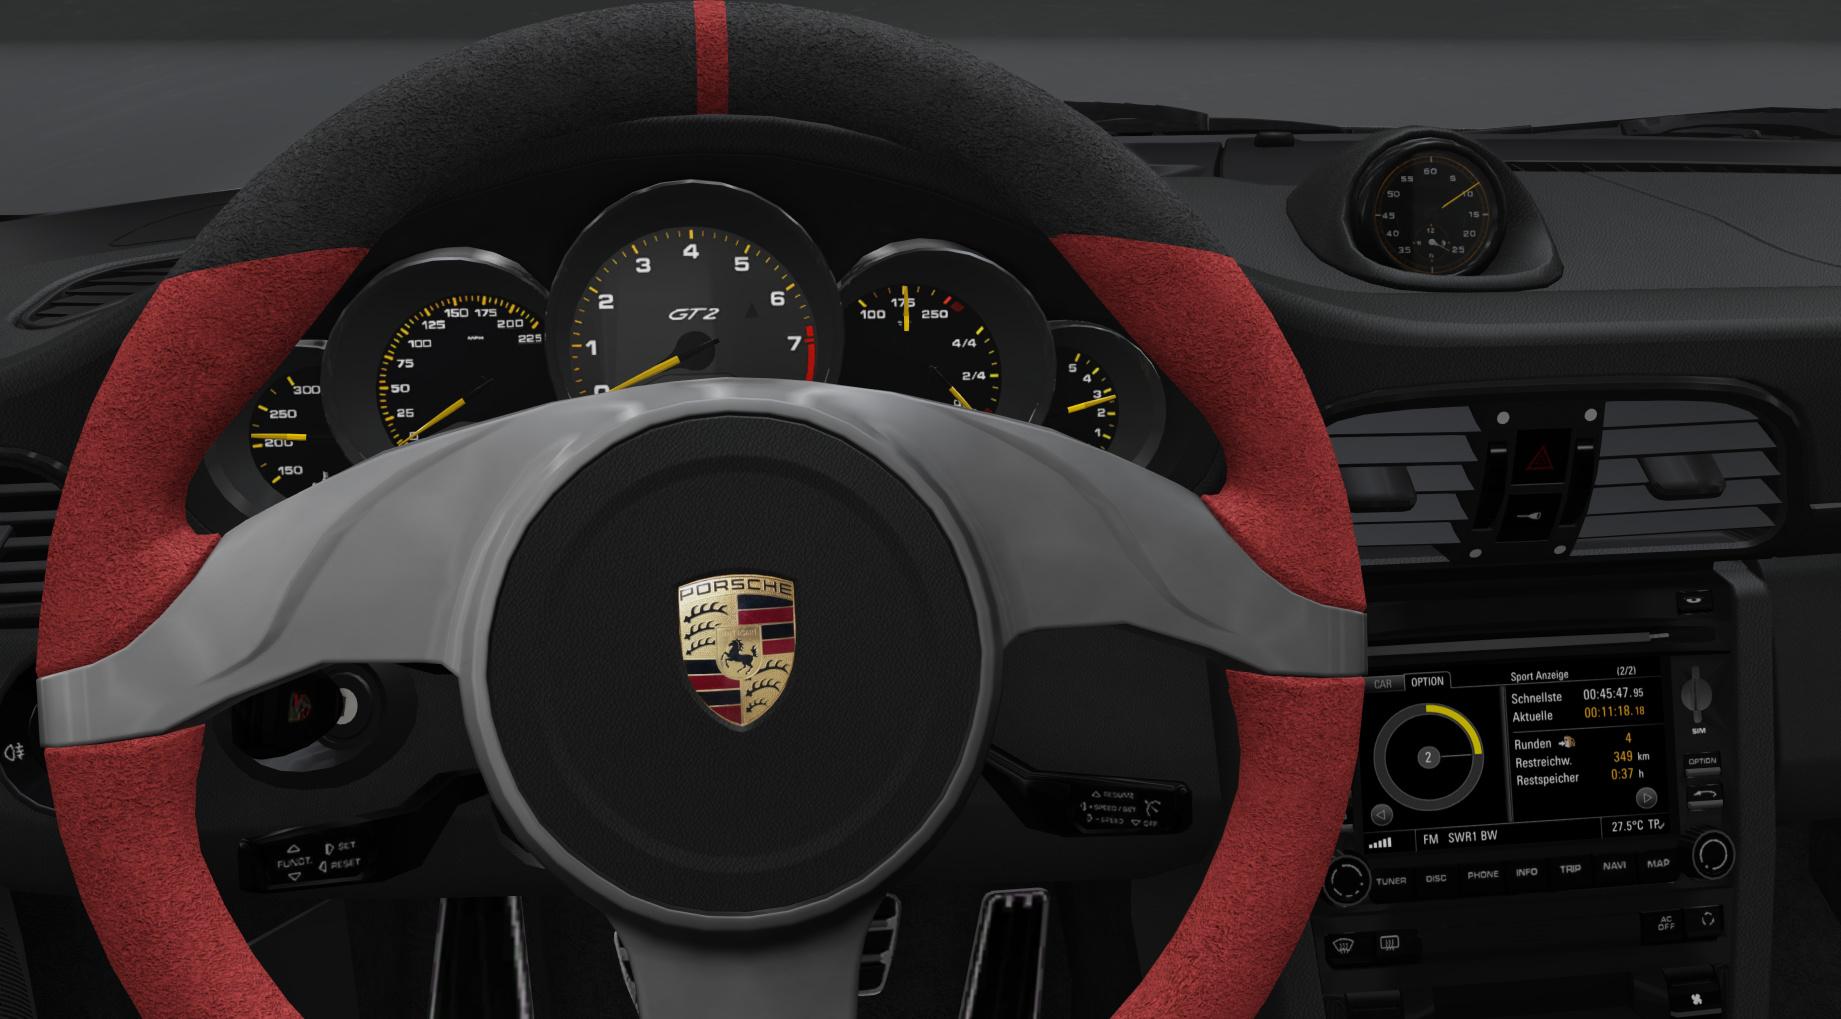 Porsche 997 GT2RS complete revision 2017 Assetto Corsa 1.14 017.jpg